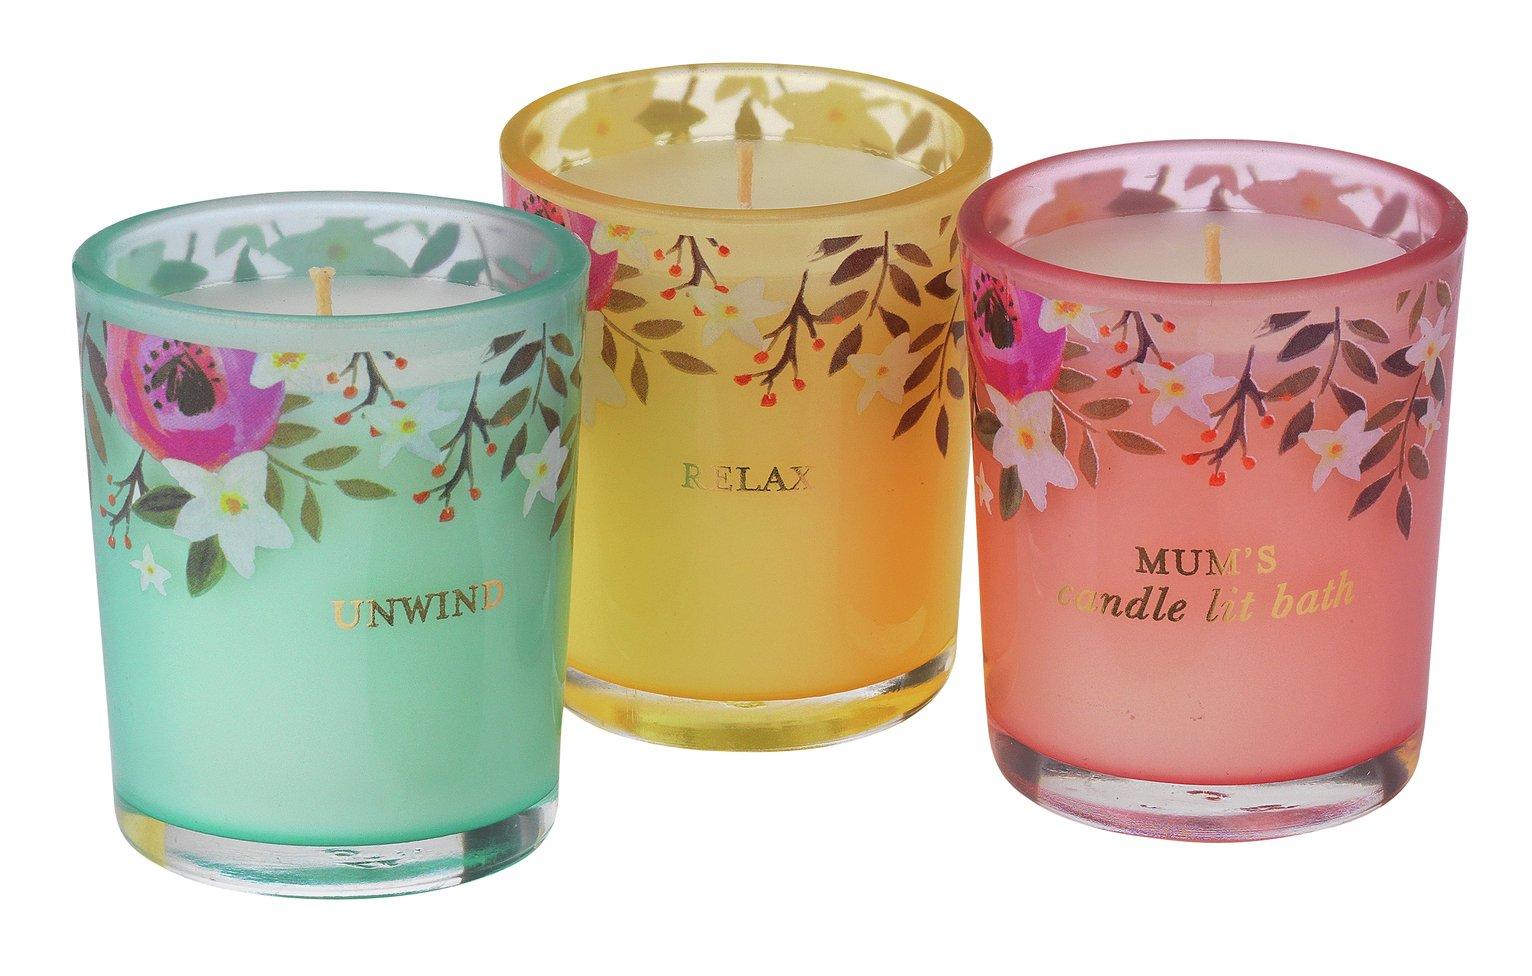 Argos Home Mum's Candle Lit Bath 3 Candles review